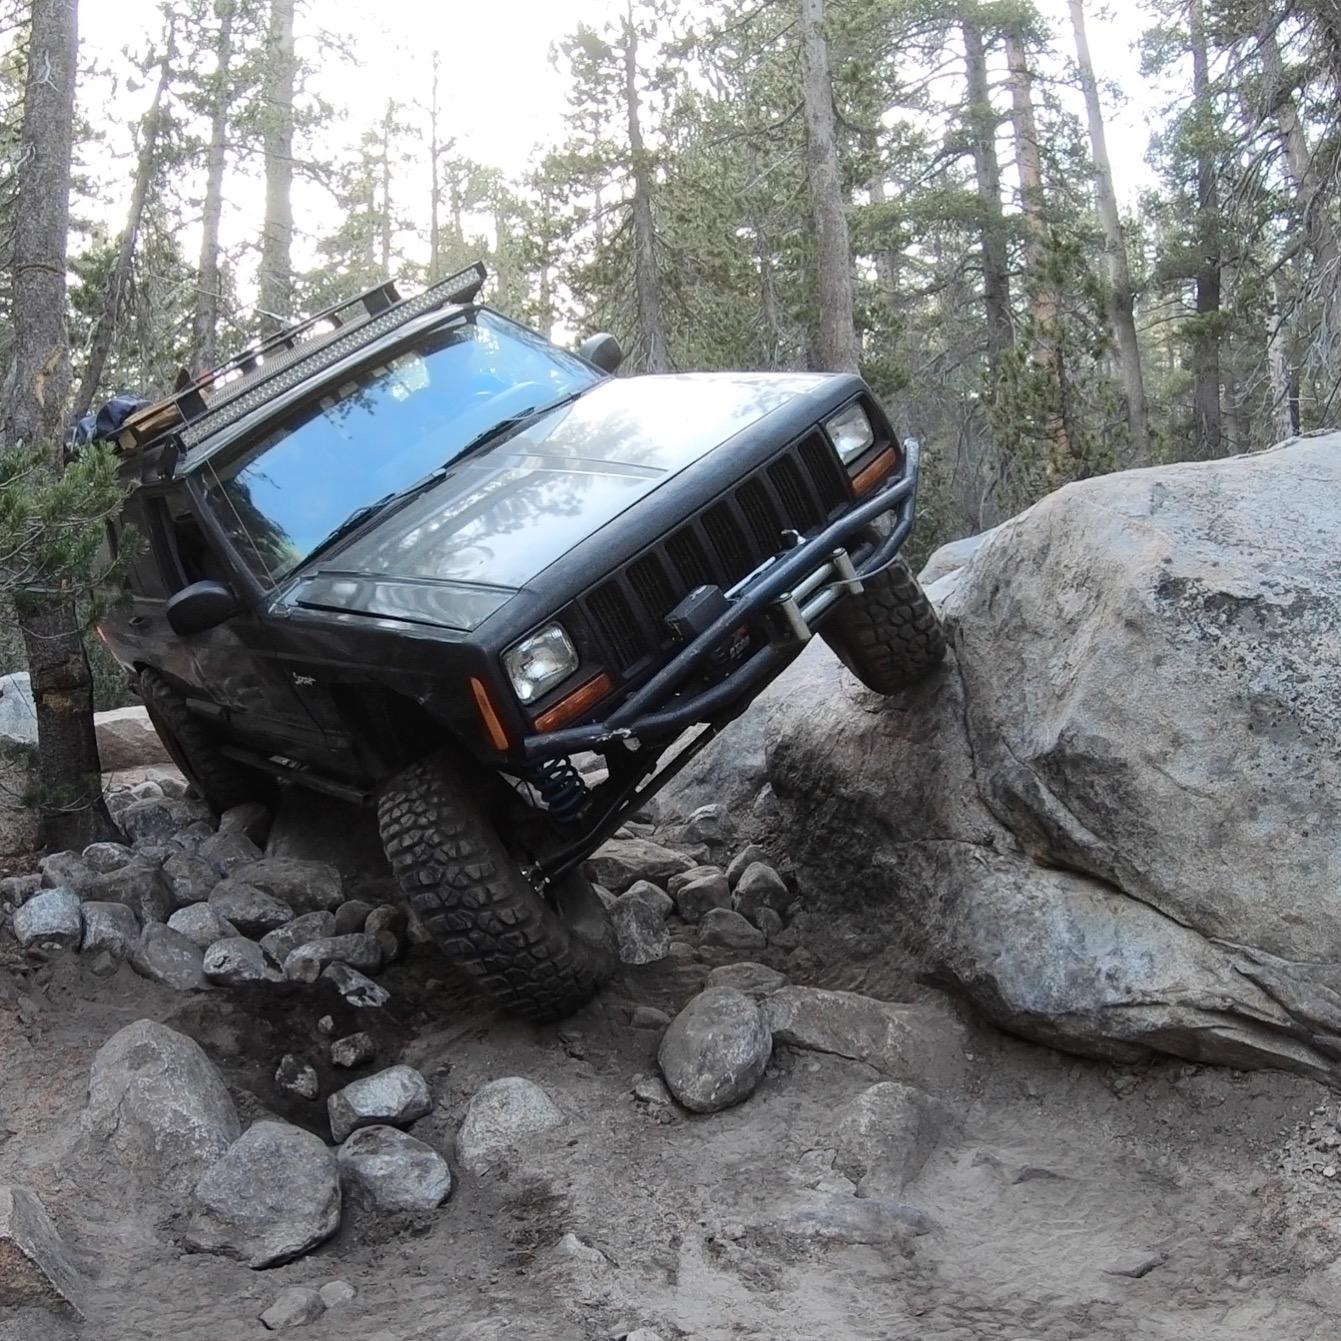 Trail Review: 26E213 - Coyote Lake Trail